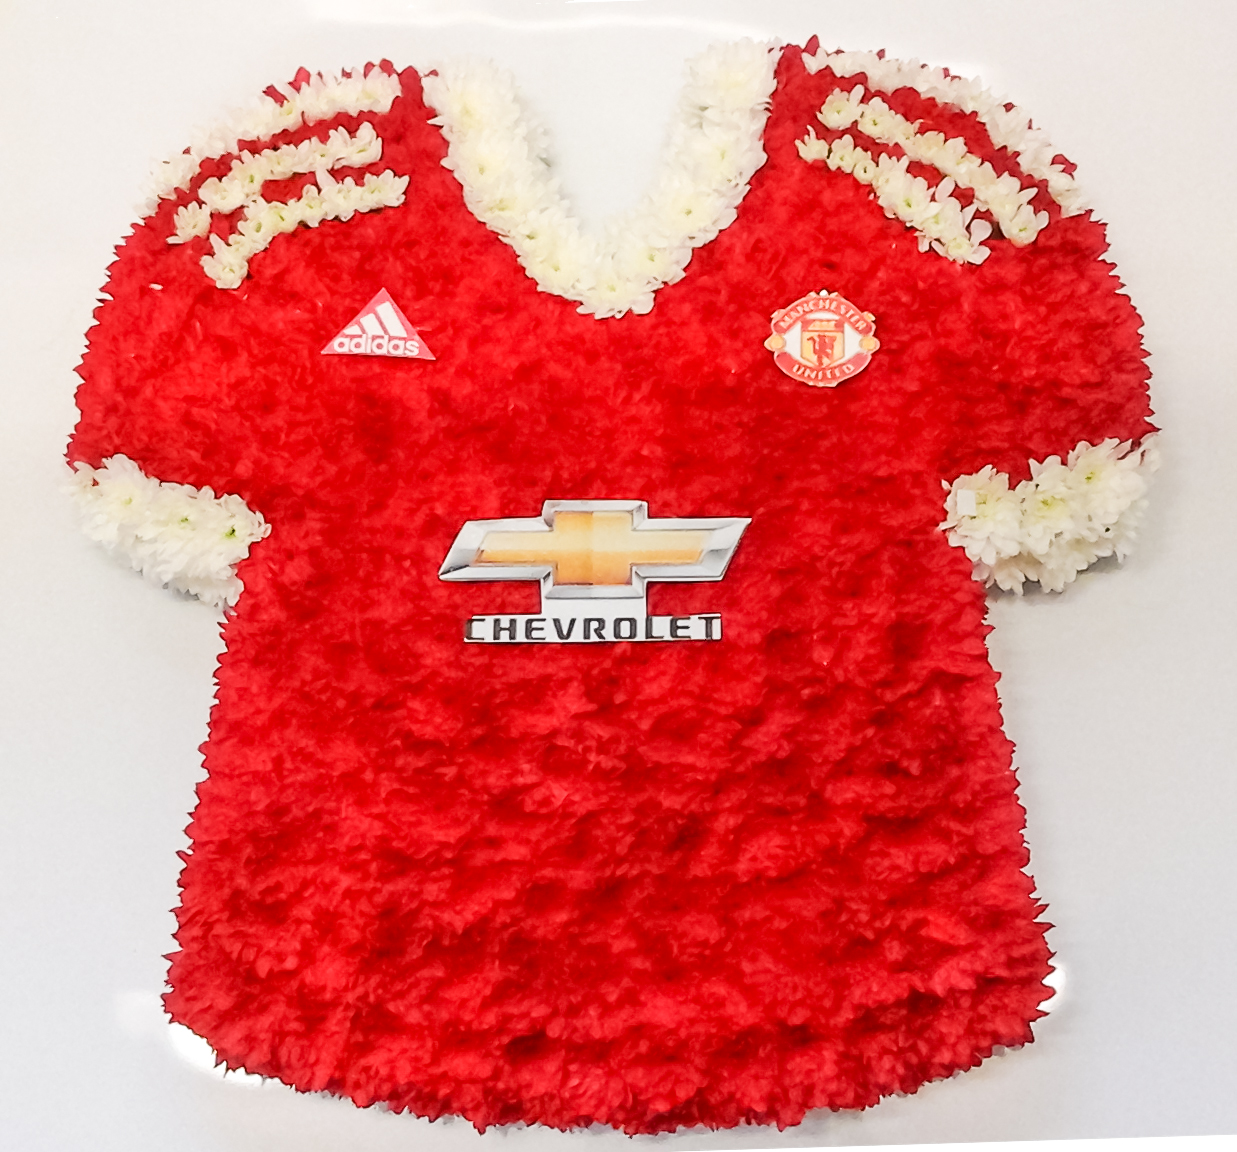 Funeral special tribute flowers football badge radcliffe bury man united shirt 2015 izmirmasajfo